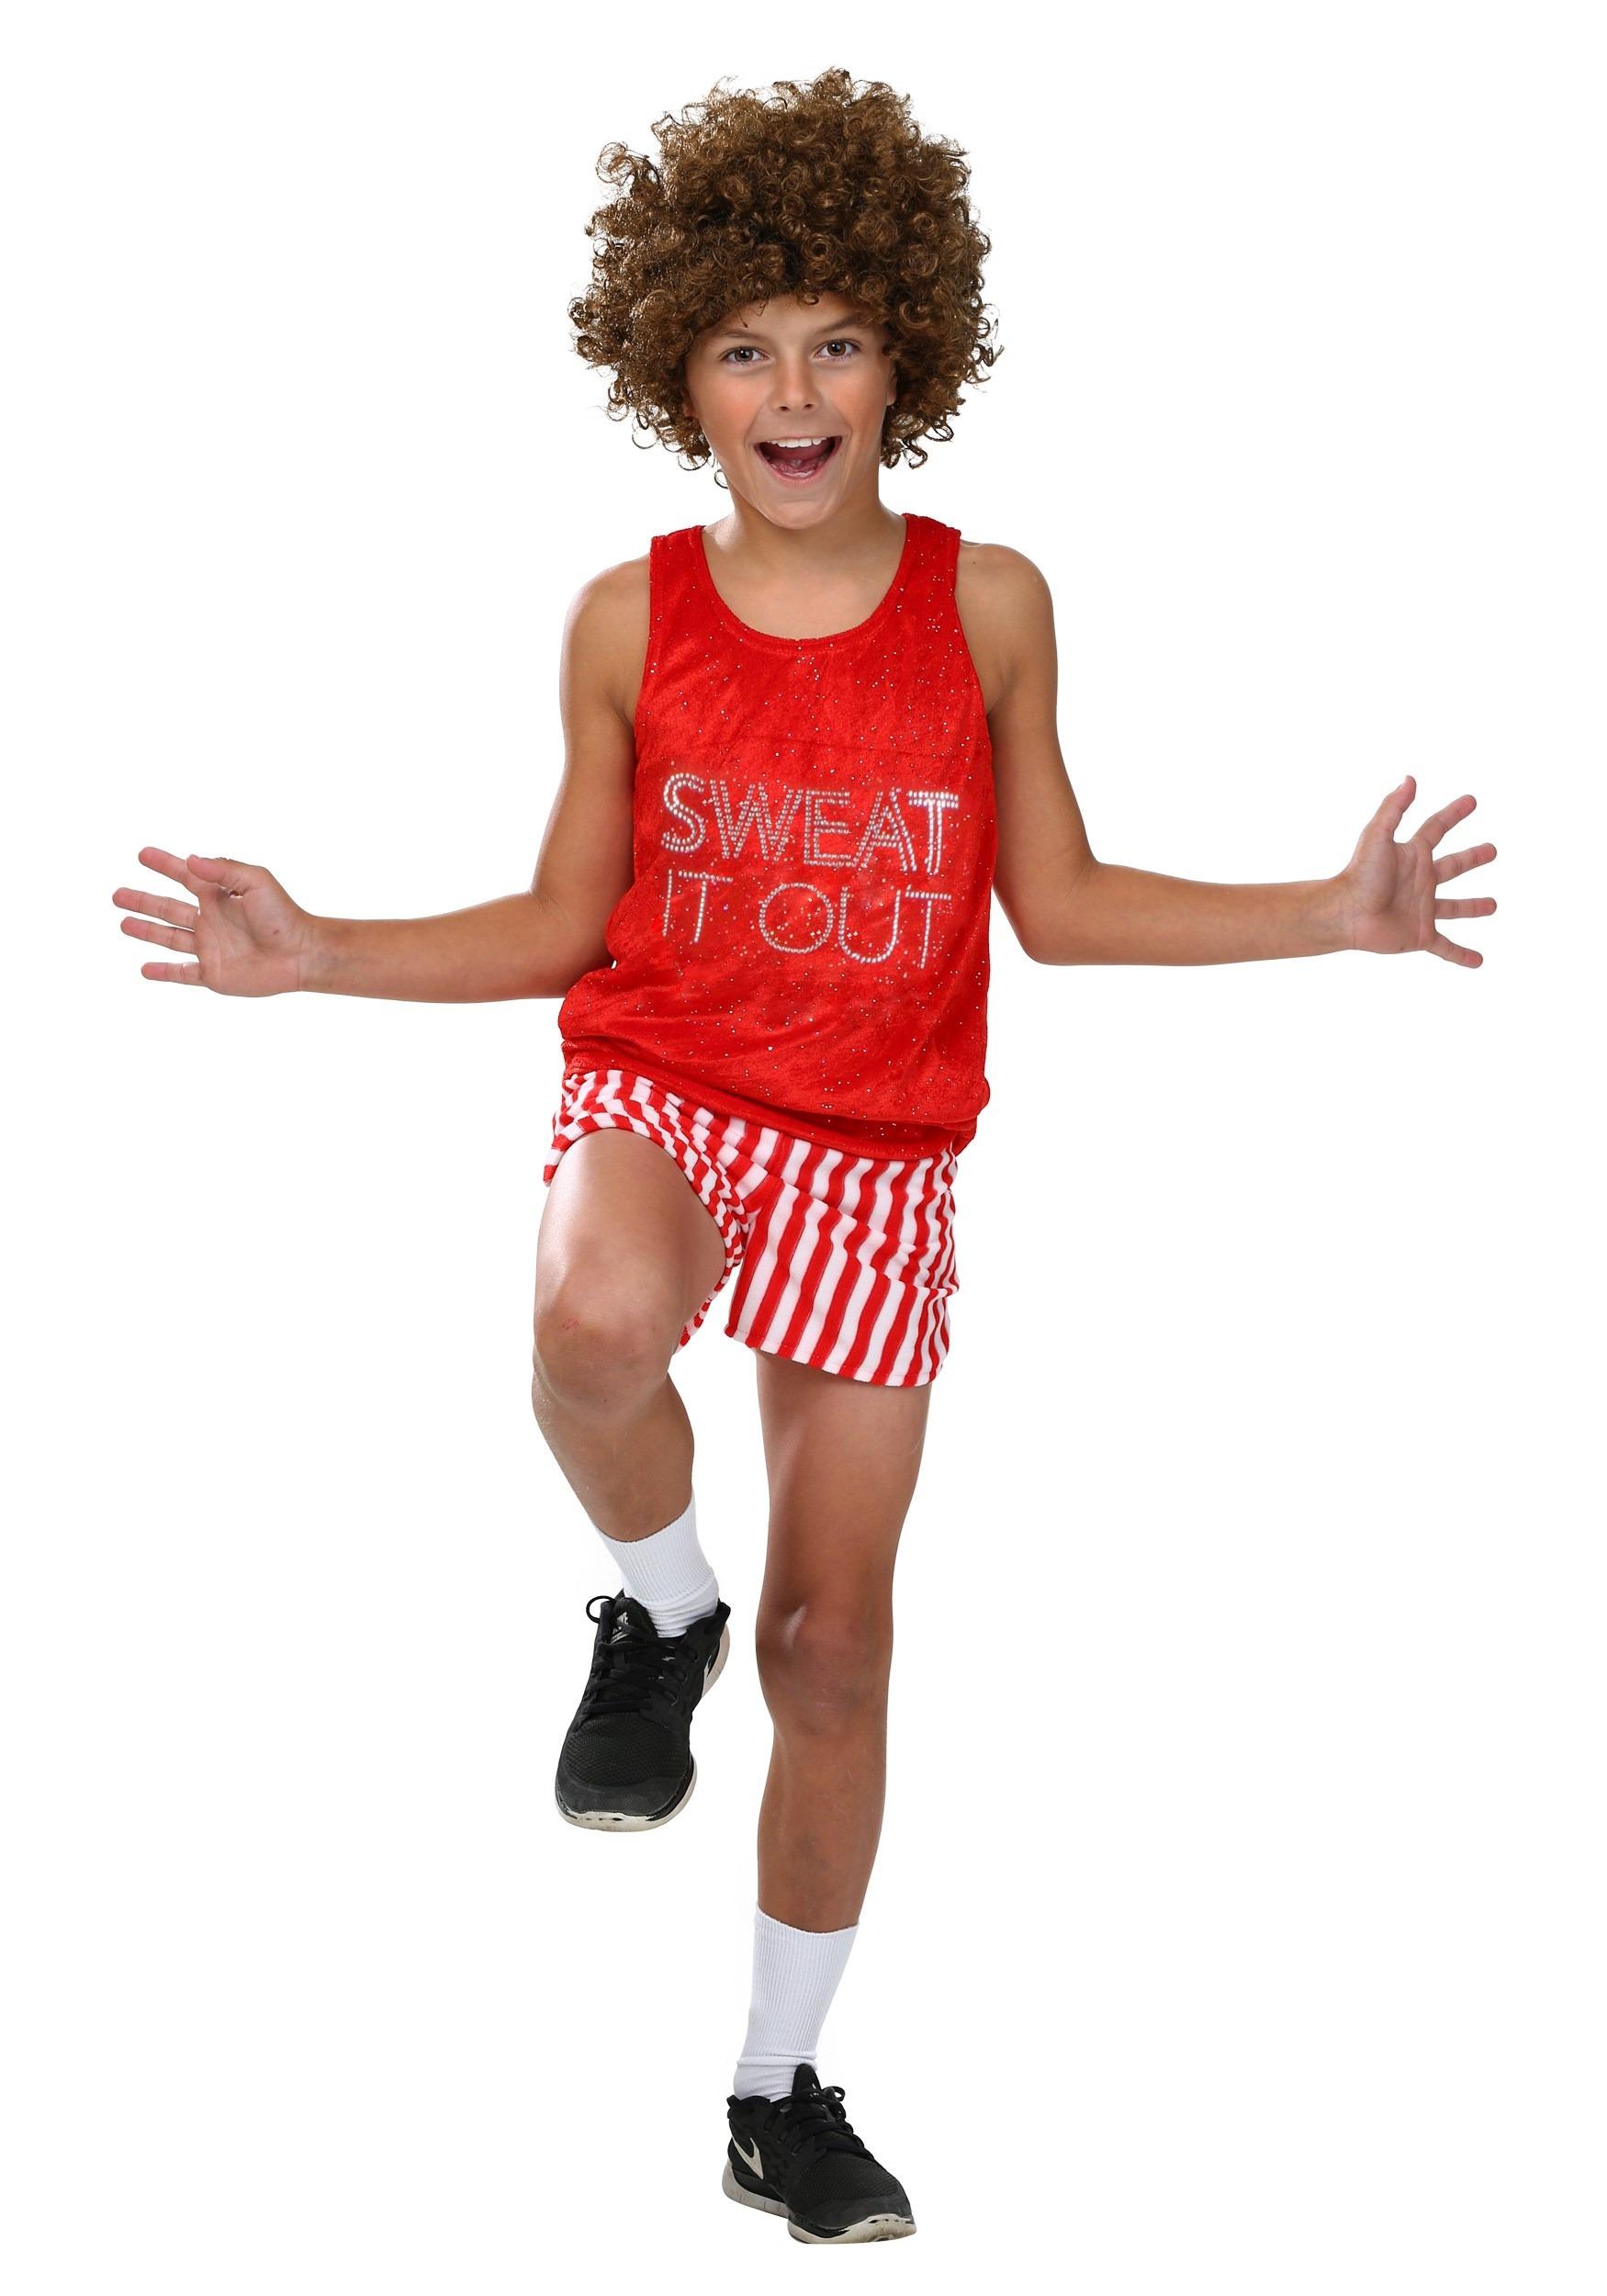 Kids Richard Simmons Costume